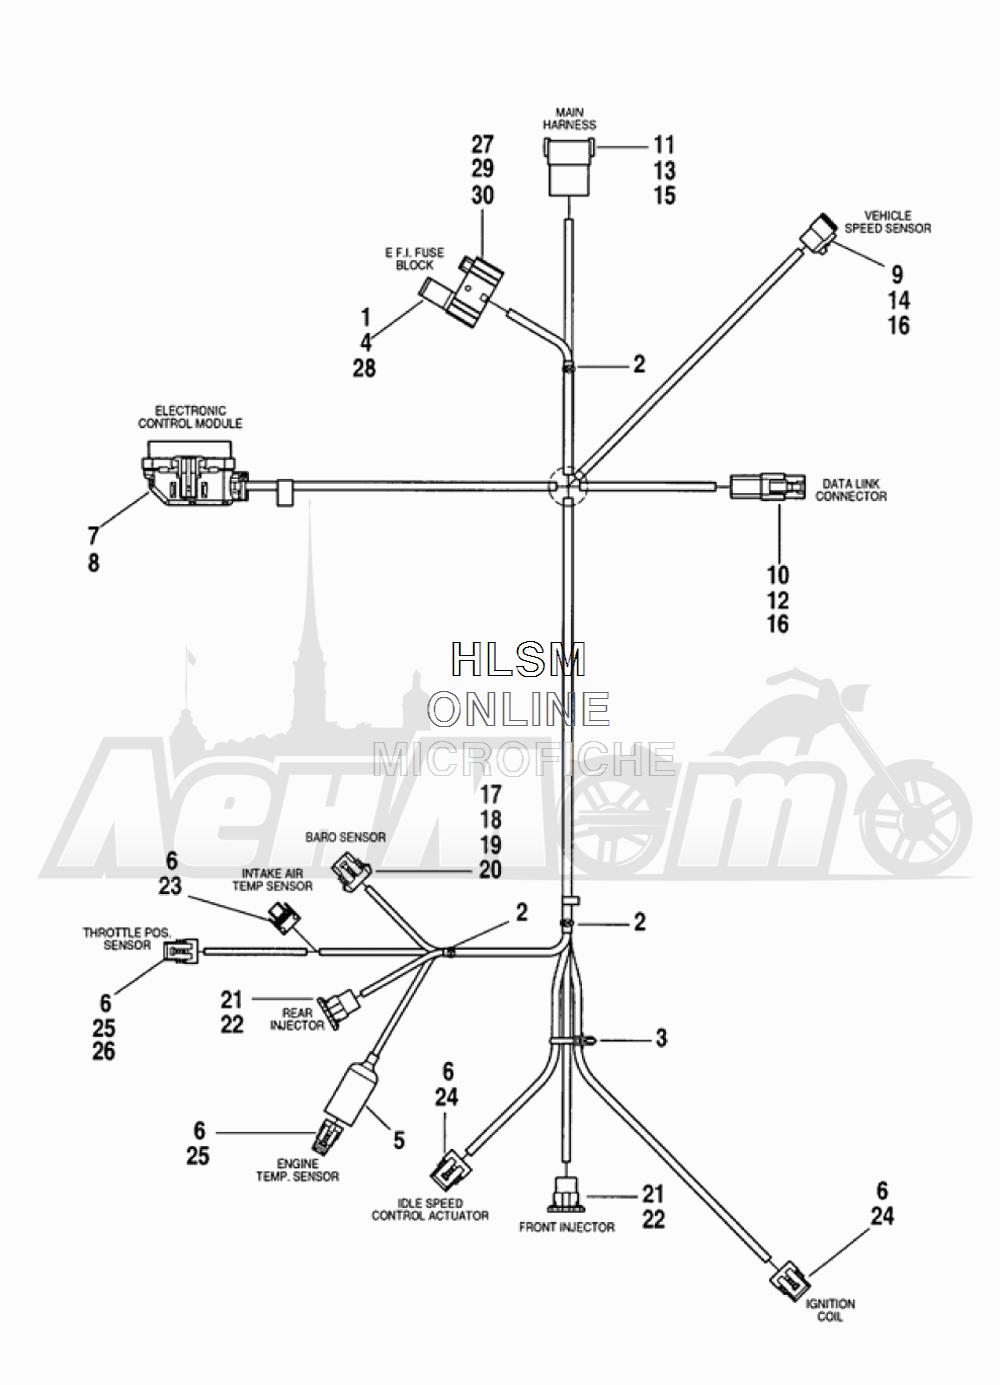 Запчасти для Мотоцикла Harley-Davidson 2005 FLTRI ROAD GLIDE® (INJECTION) (FS) Раздел: ELECTRICAL - WIRING HARNESS ASSEMBLY | электрика электропроводка коса в сборе